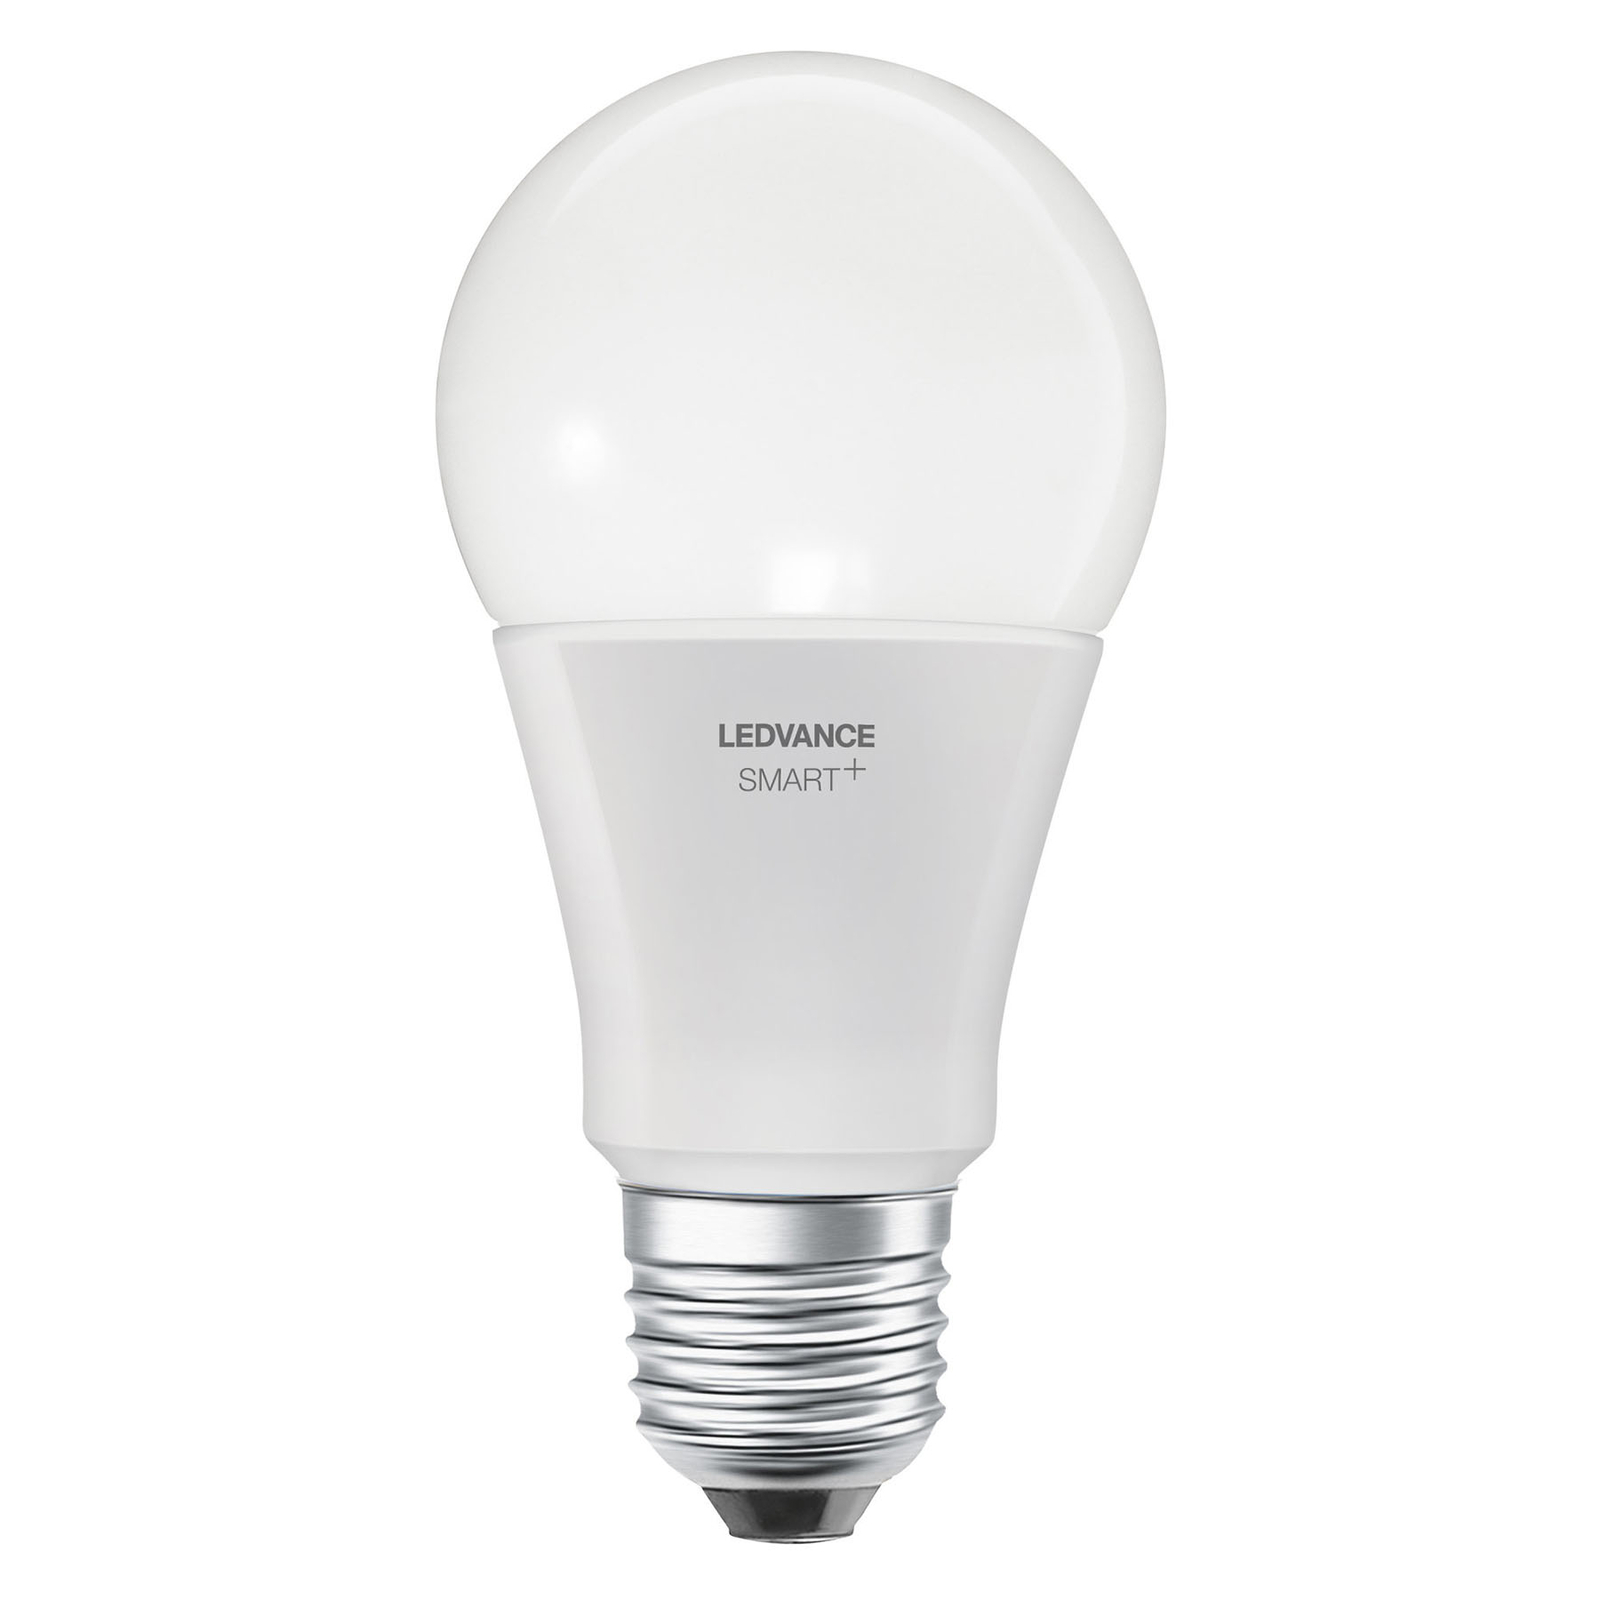 LEDVANCE SMART+ WiFi E27 14W Classic 2700-6500K